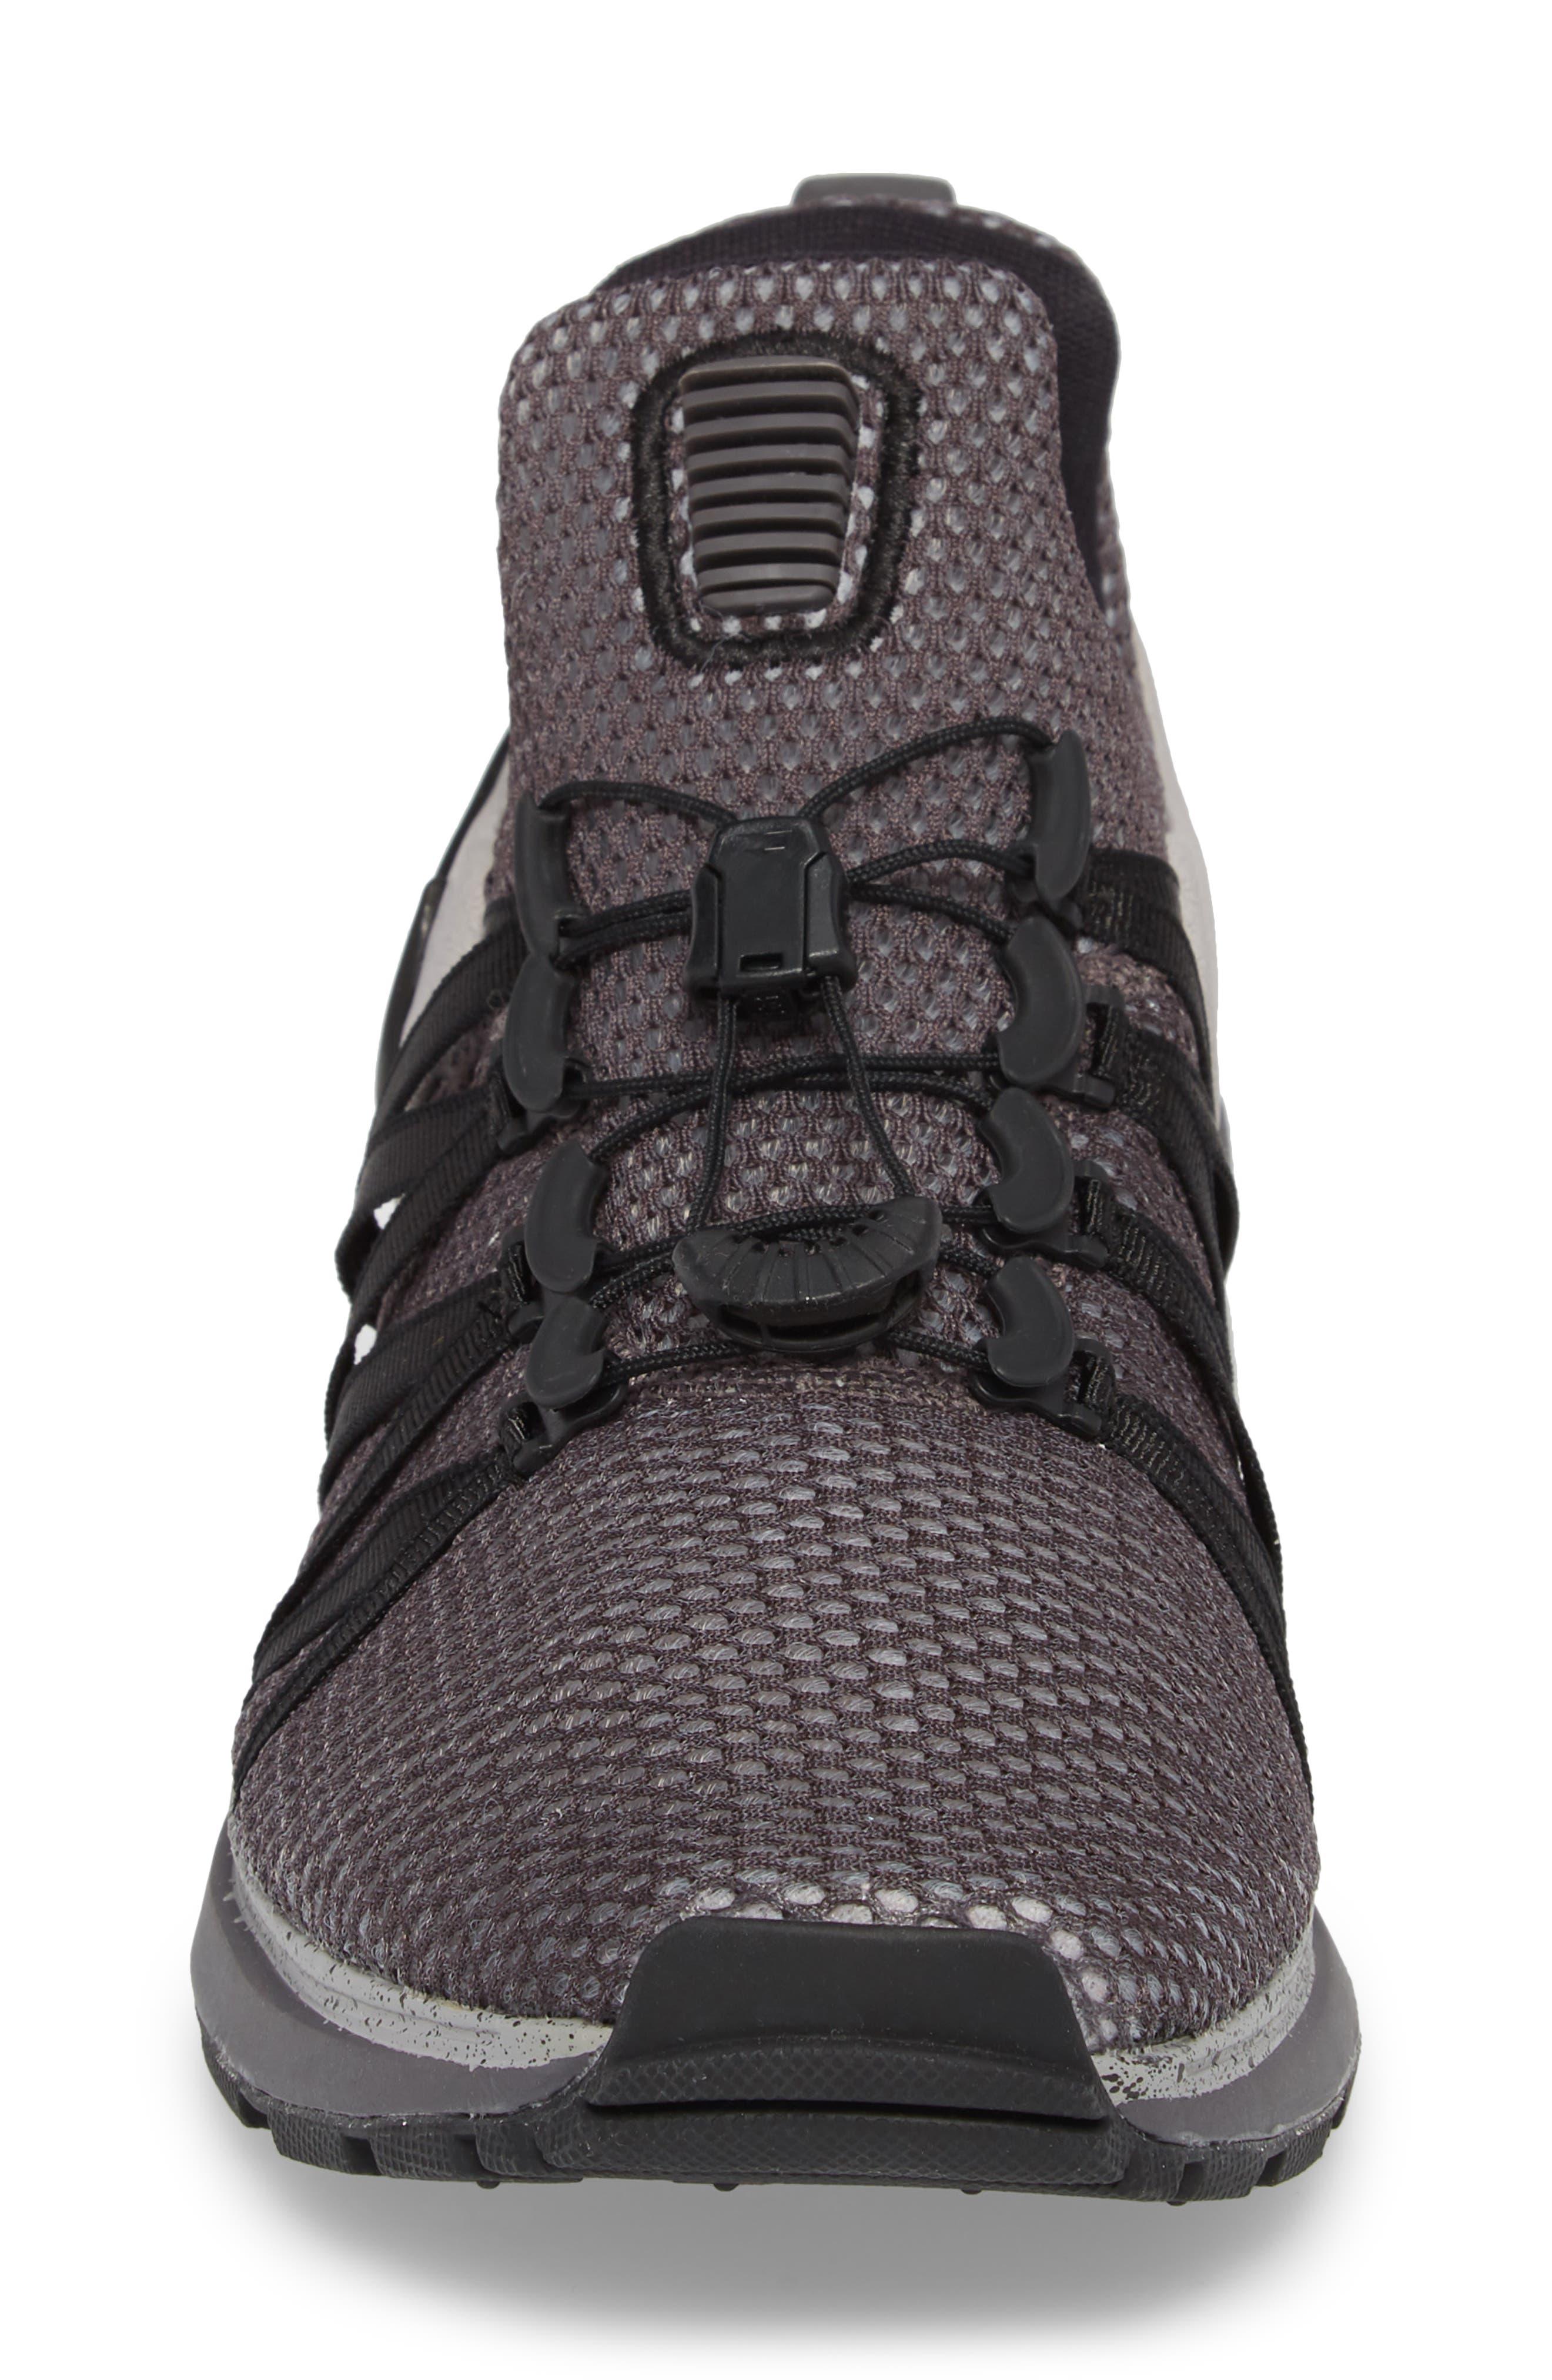 Shox Gravity Sneaker,                             Alternate thumbnail 4, color,                             ATMOSPHERE GREY/ BLACK/ GREY